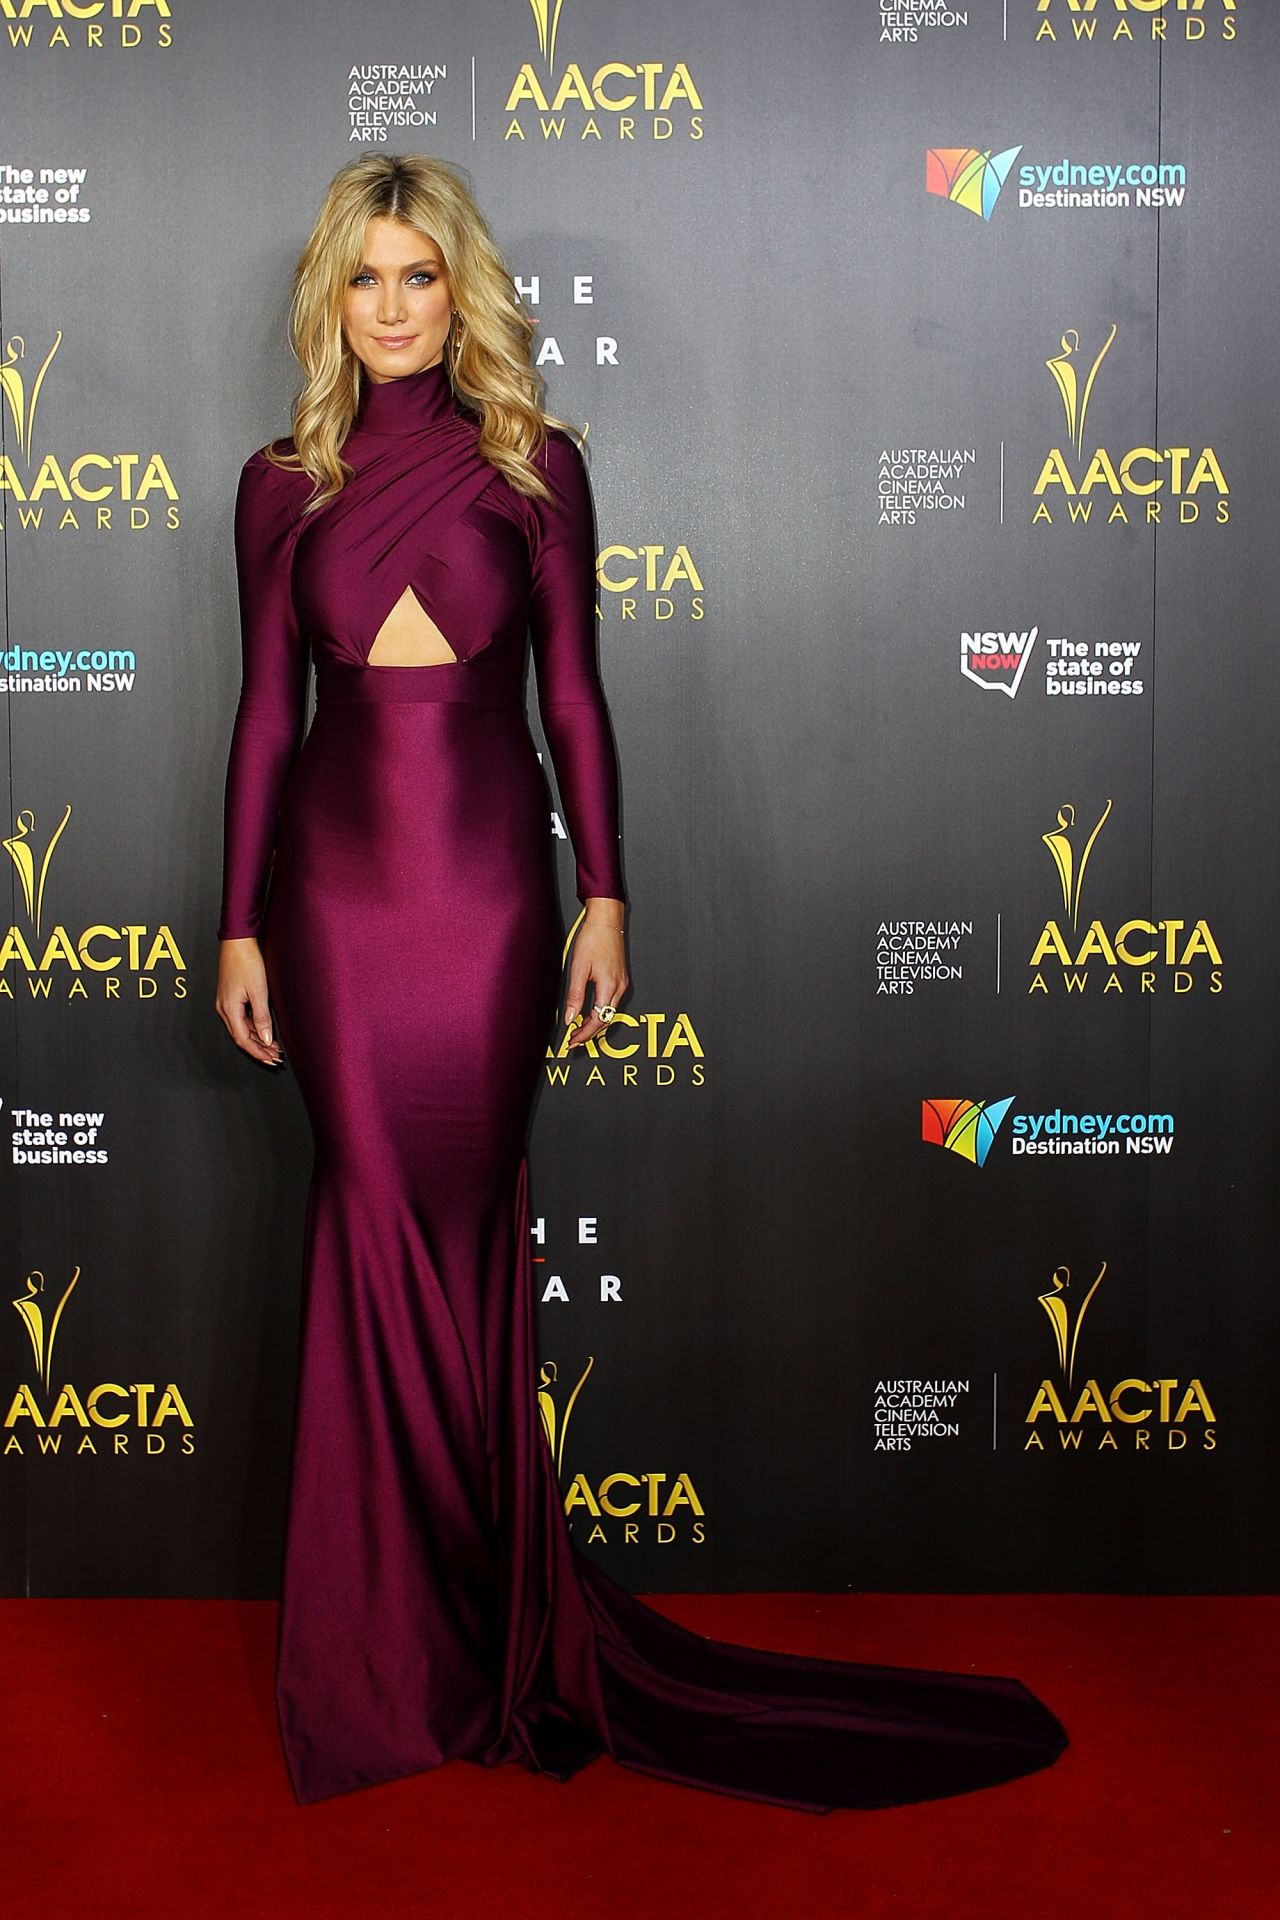 aacta awards - photo #23